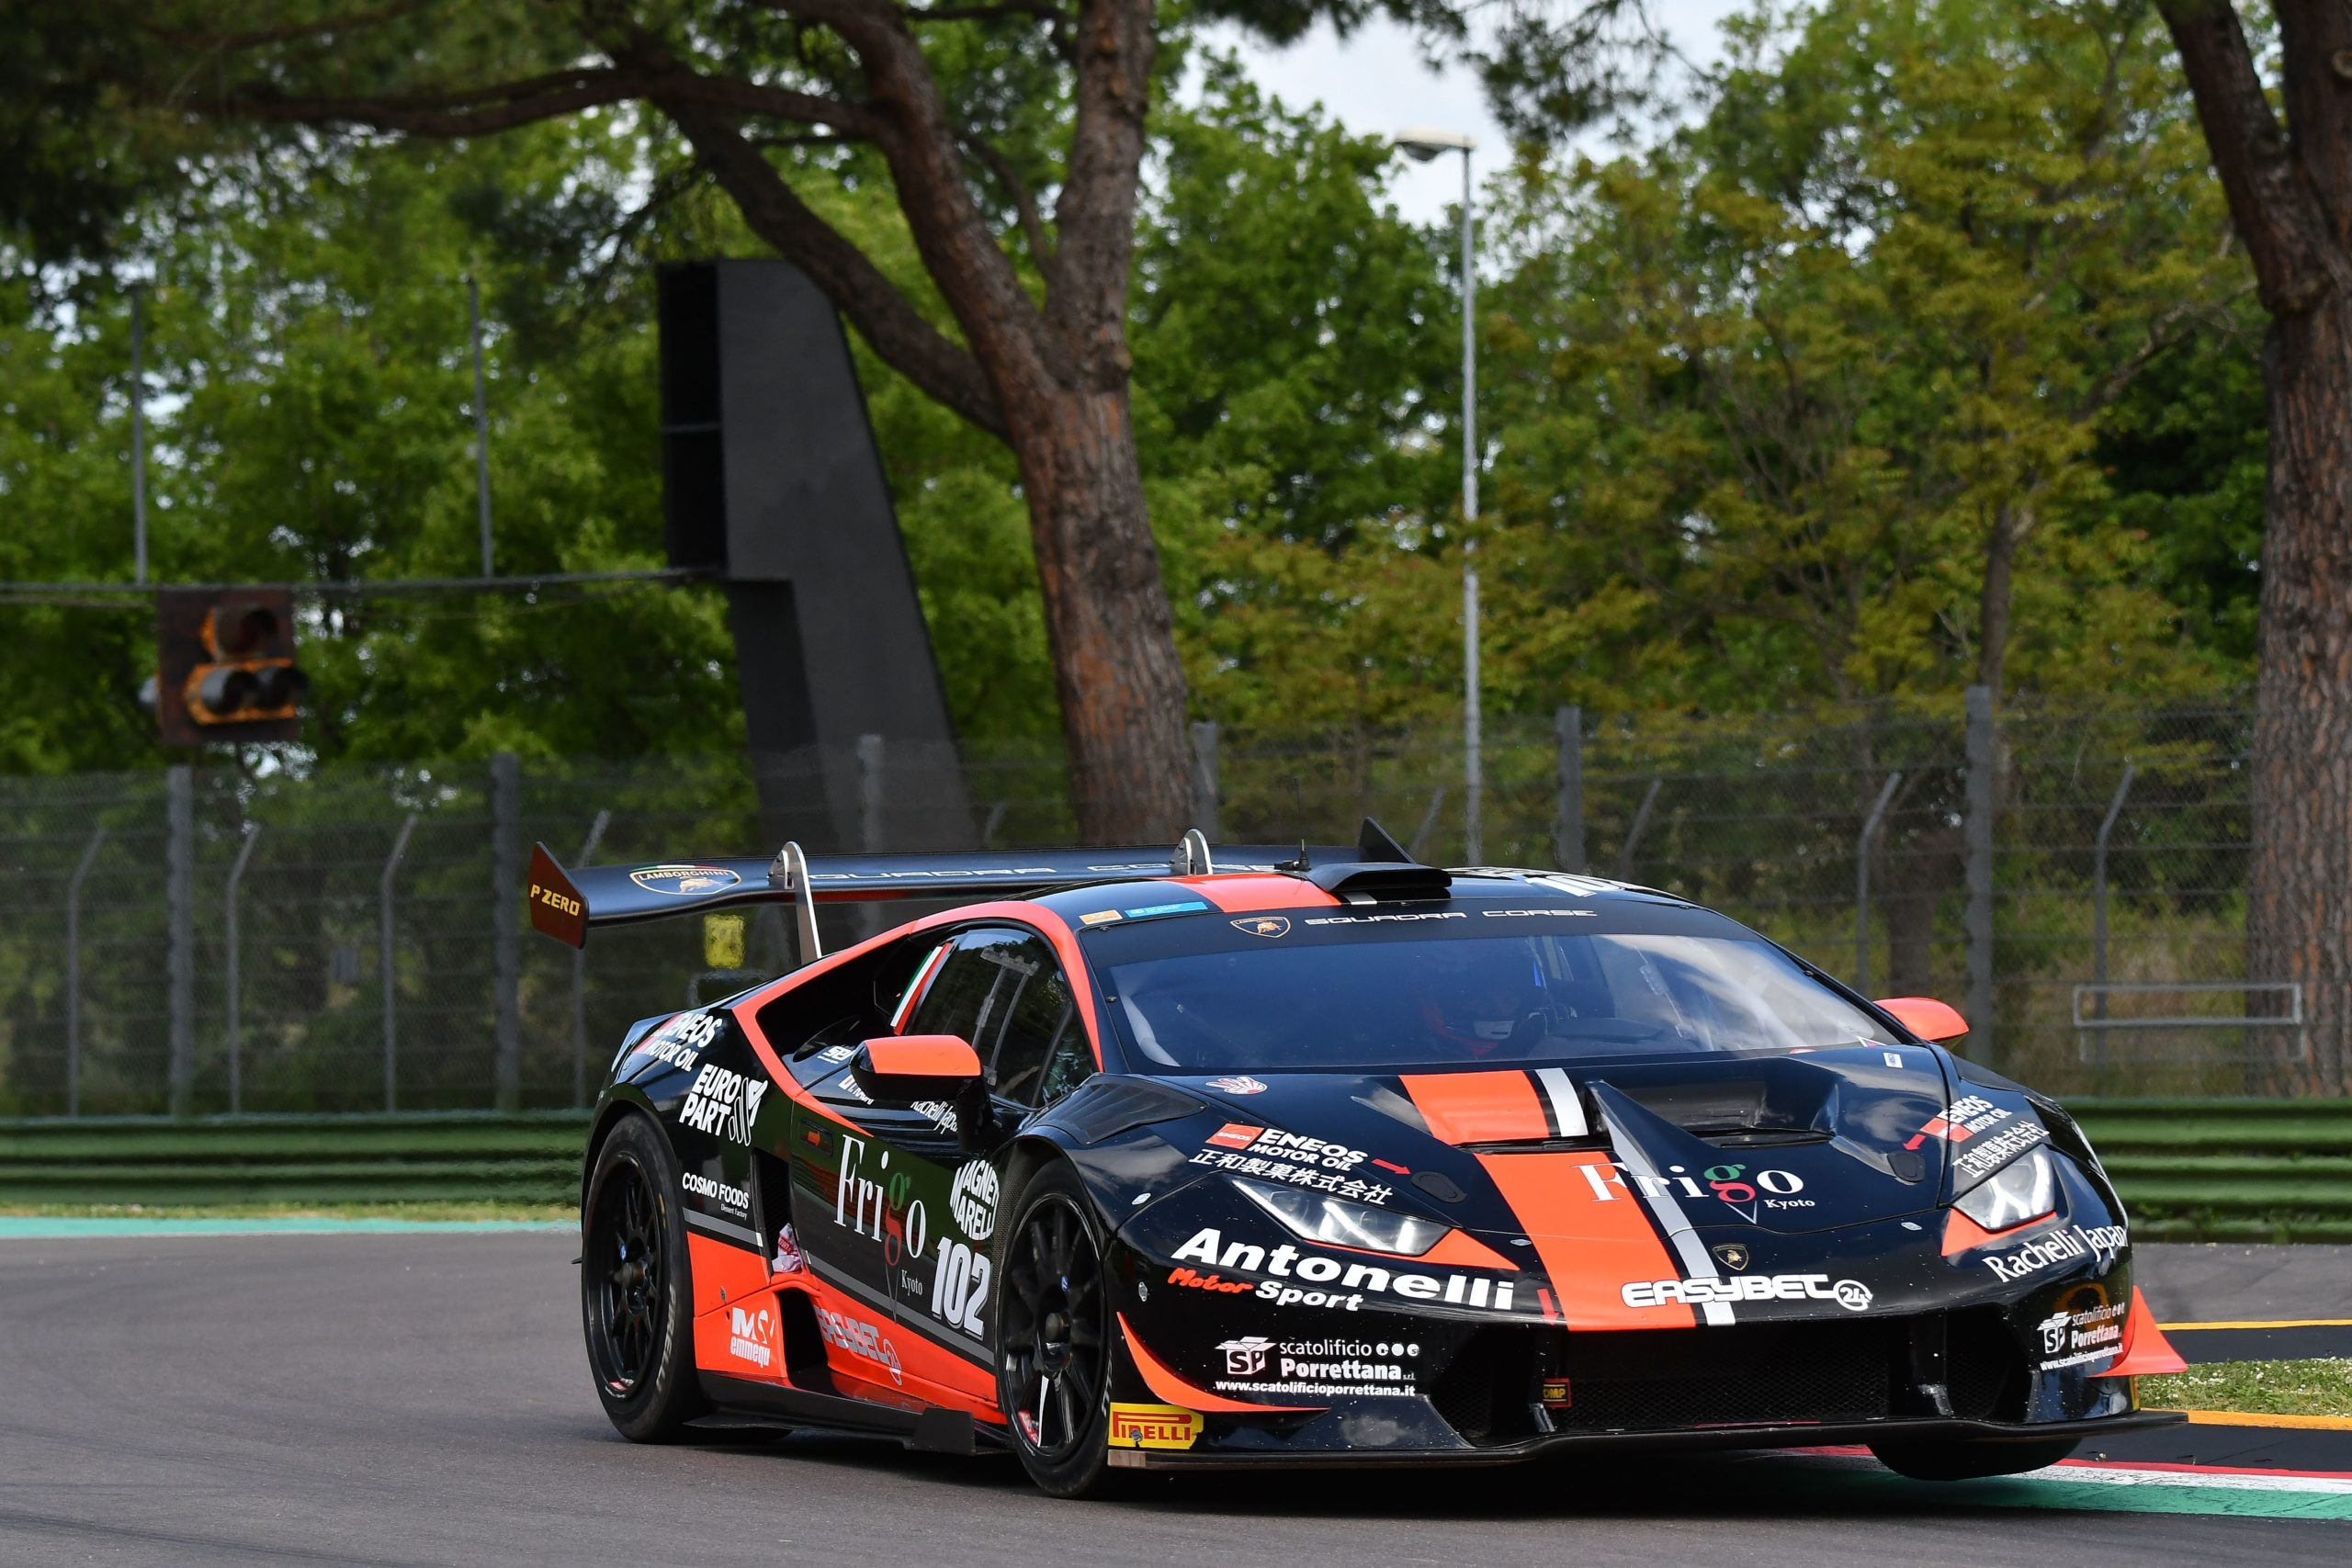 Takashi-Basaz (Antonelli Motorsport,Lamborghini Huracan-S.GTCup #102)